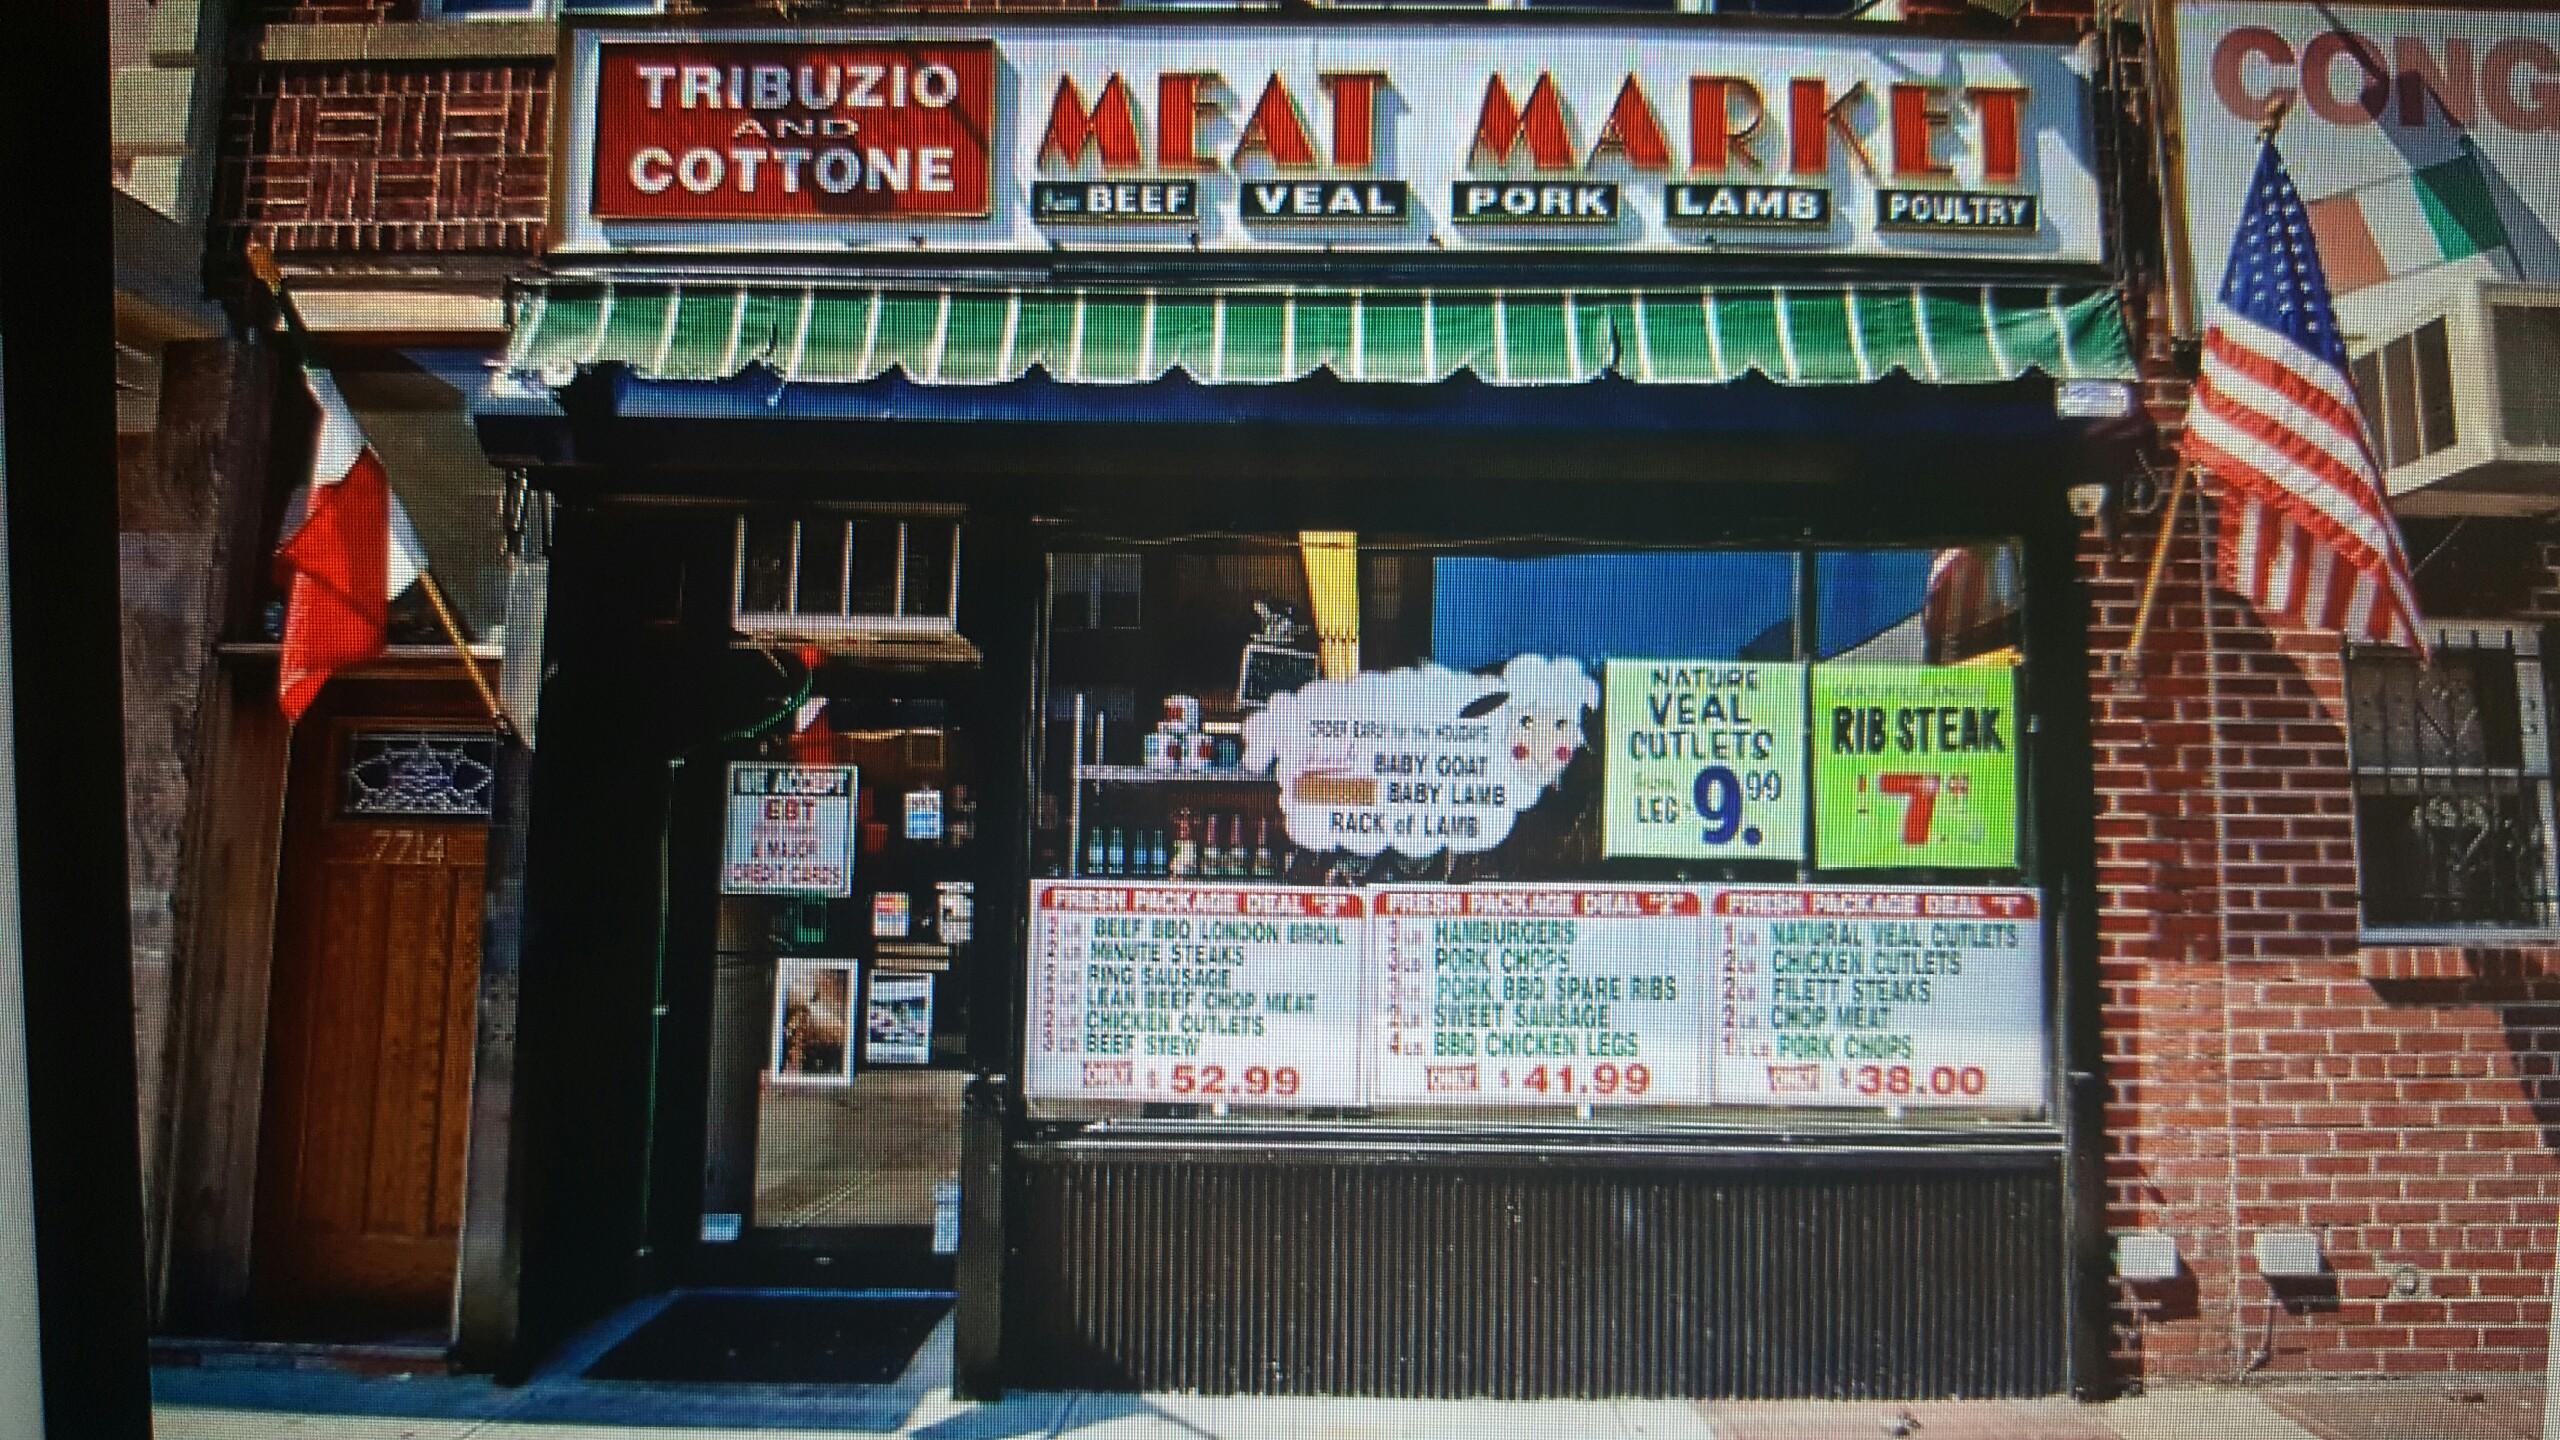 Tribuzio Meat Market